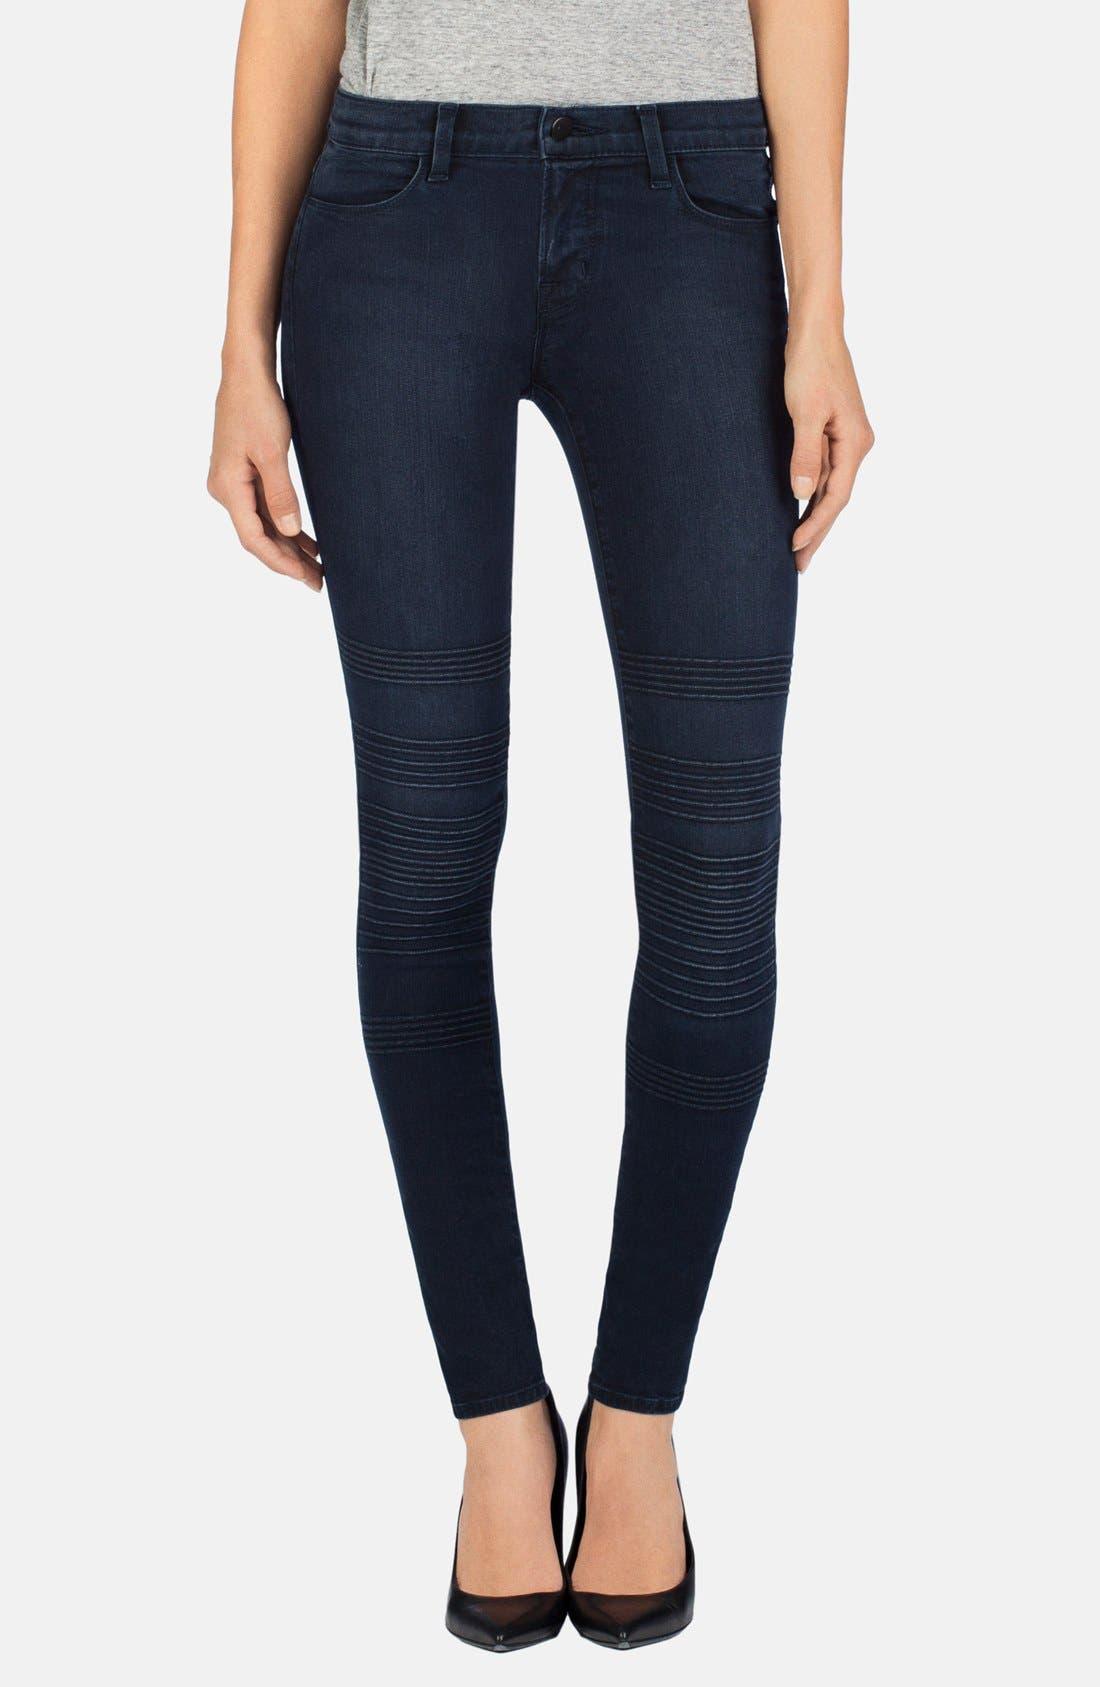 Alternate Image 1 Selected - J Brand 'Willow' Moto Skinny Jeans (Verve)